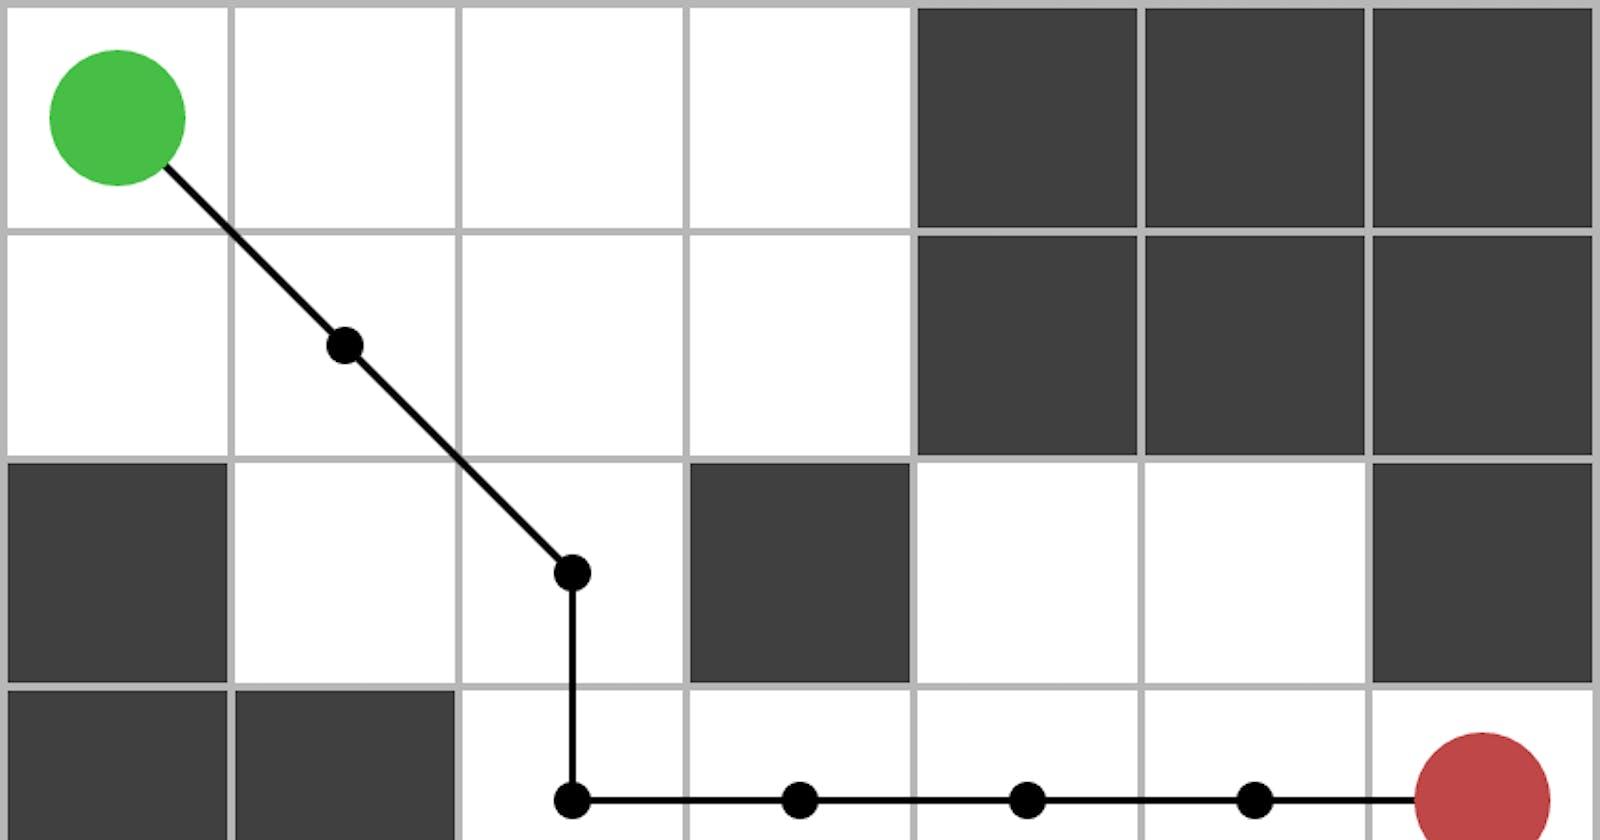 Pathfinding Algorithms